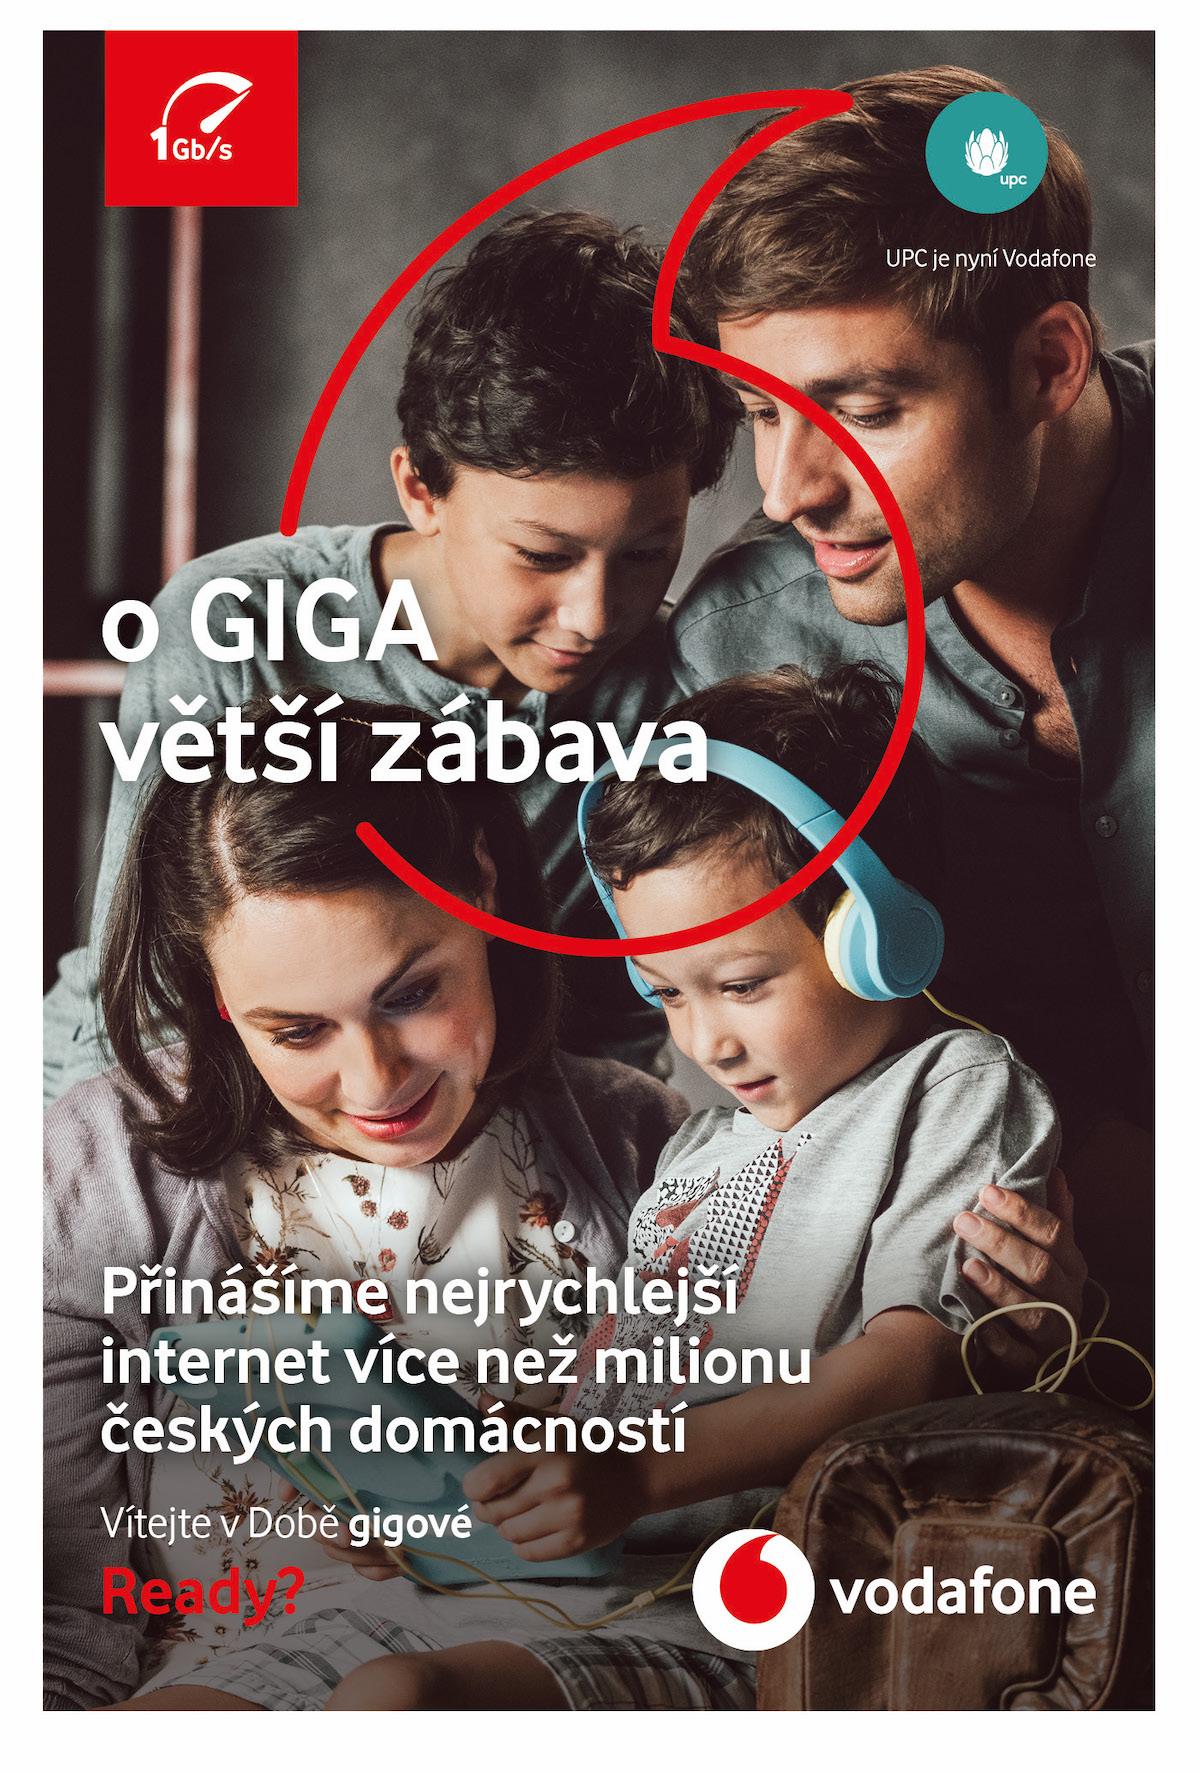 Vodafone: Doba gigová (McCann Prague)